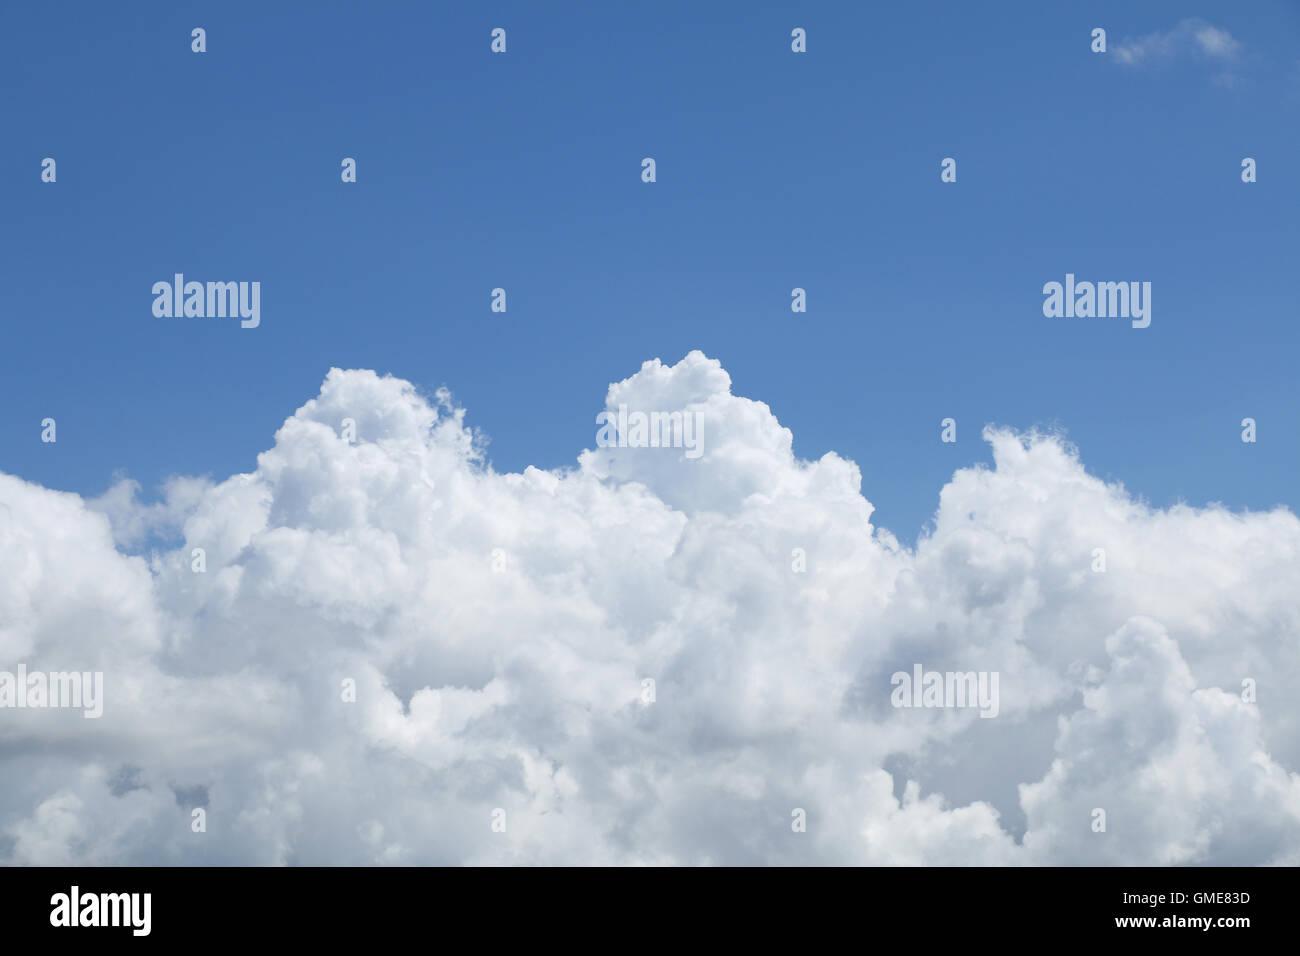 cumulonimbus cloud and blue sky background #2 - Stock Image